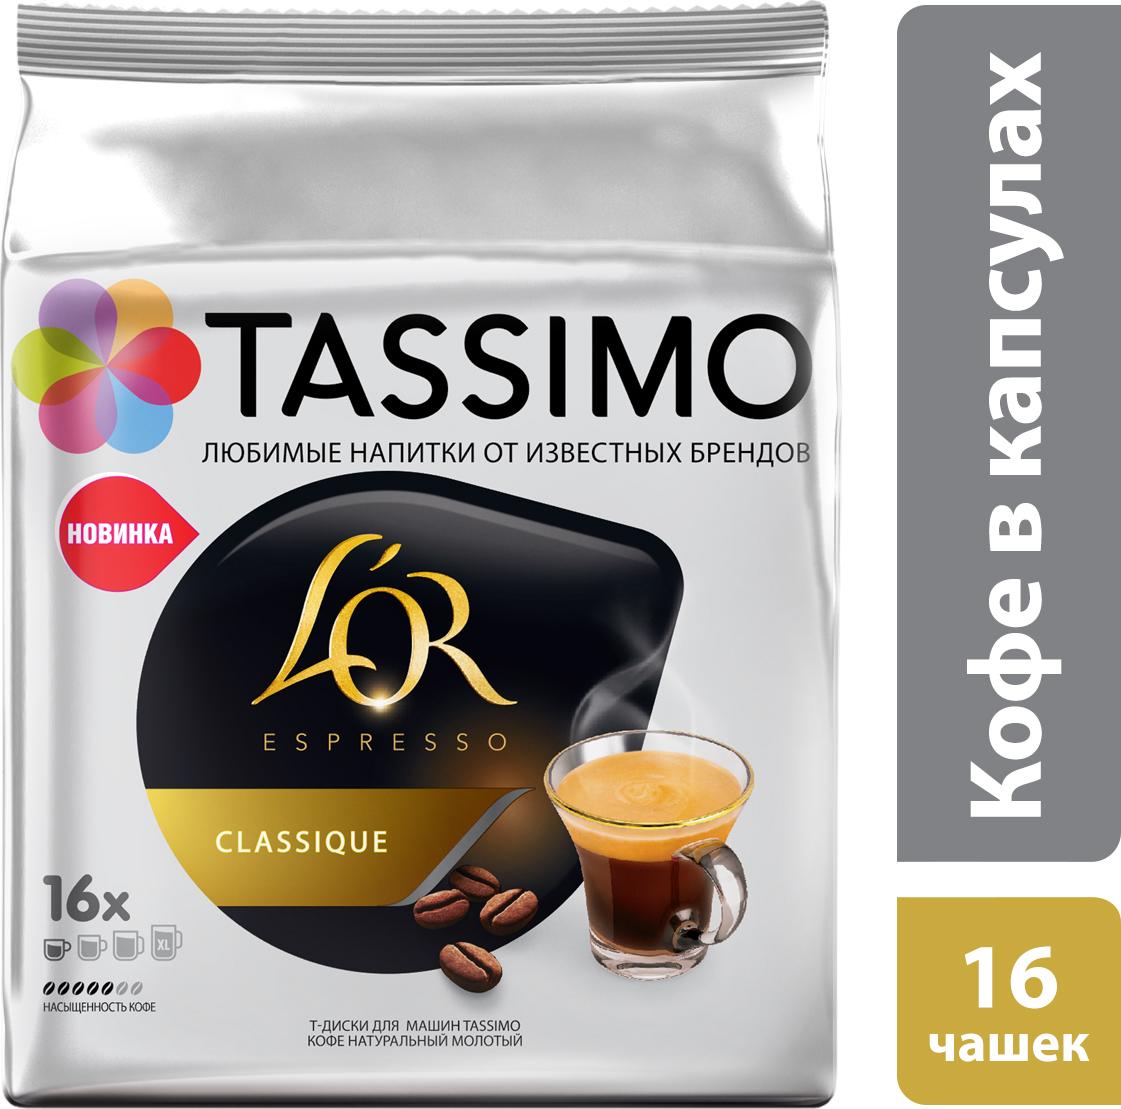 Tassimo L'or Espresso Classique кофе в капсулах, 16 шт кофе в капсулах tassimo карт нуар кафе лонг интенс 128г